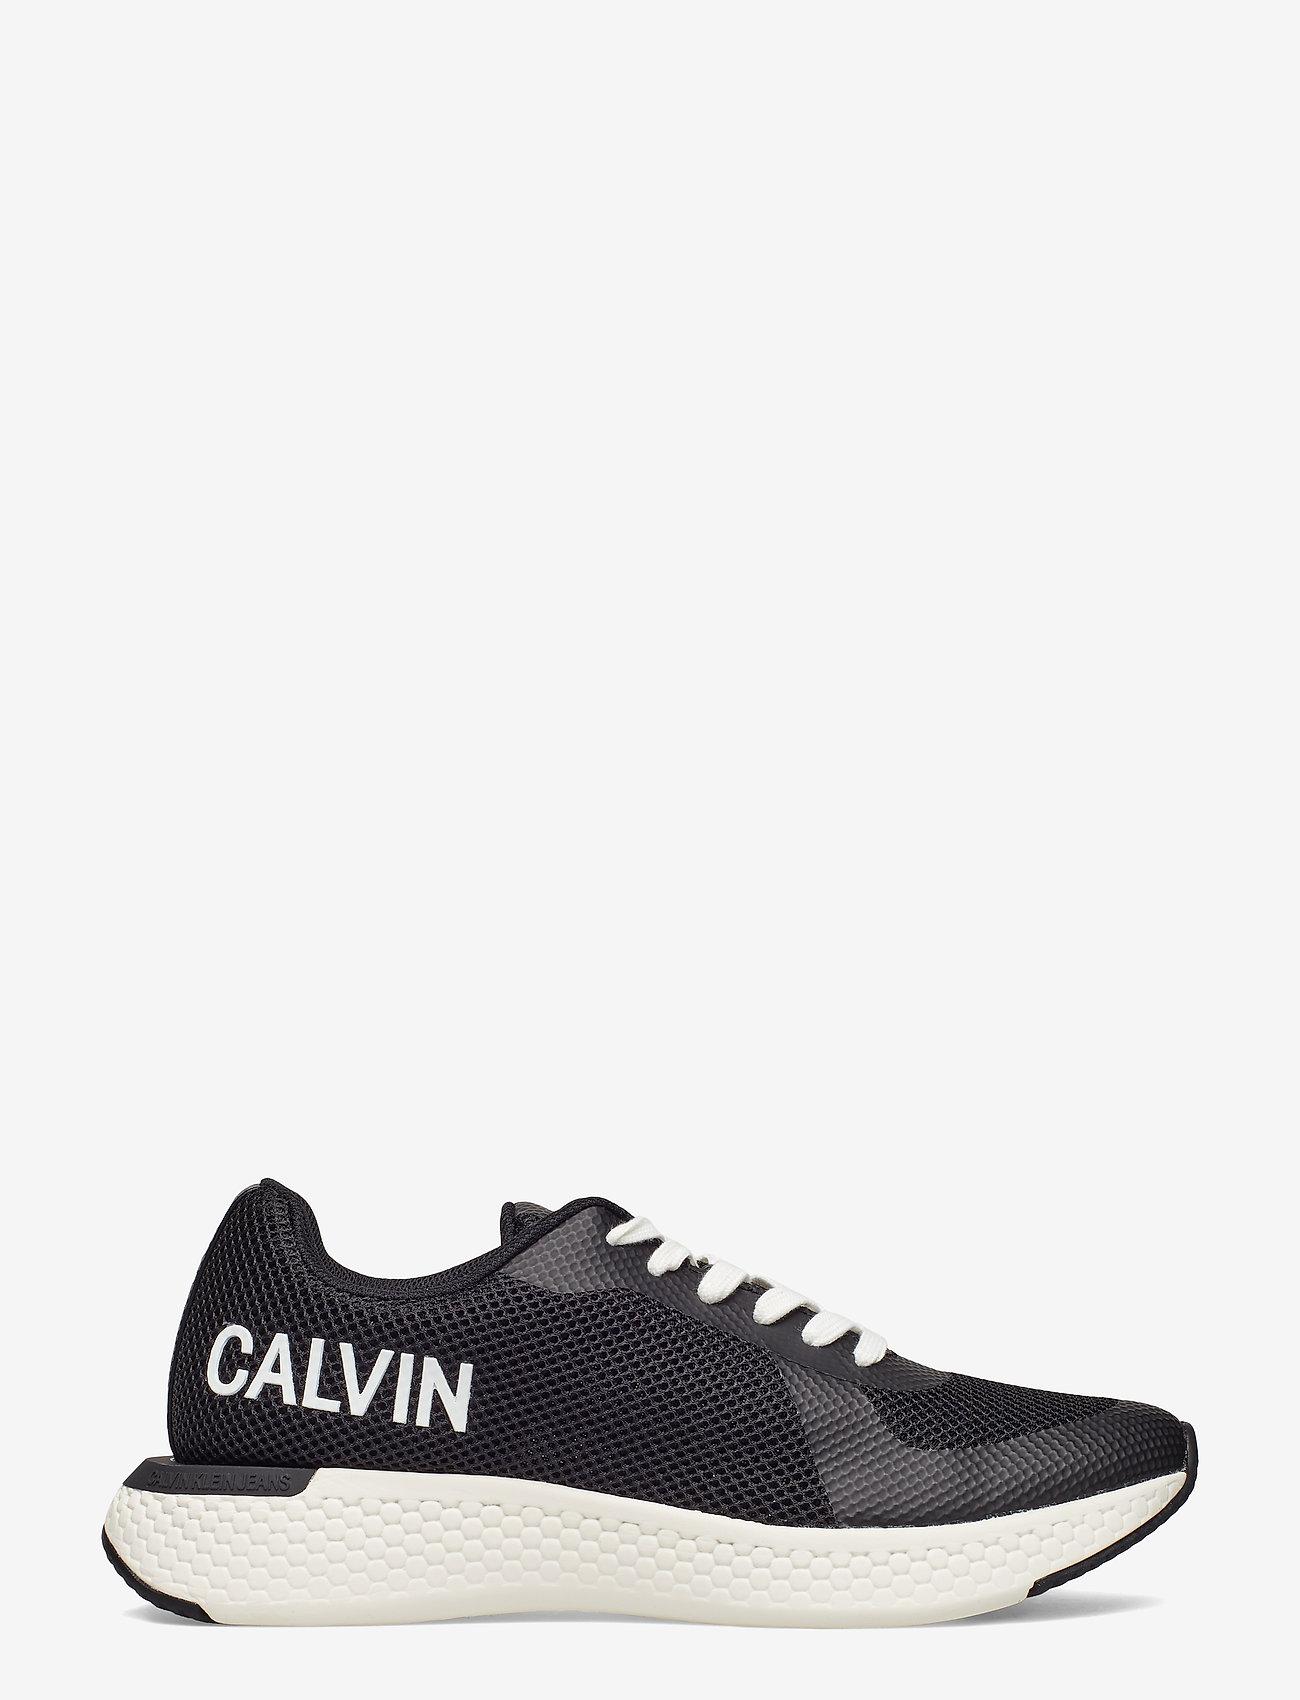 Calvin Klein - AMOS MESH/HF - laag sneakers - blk - 1